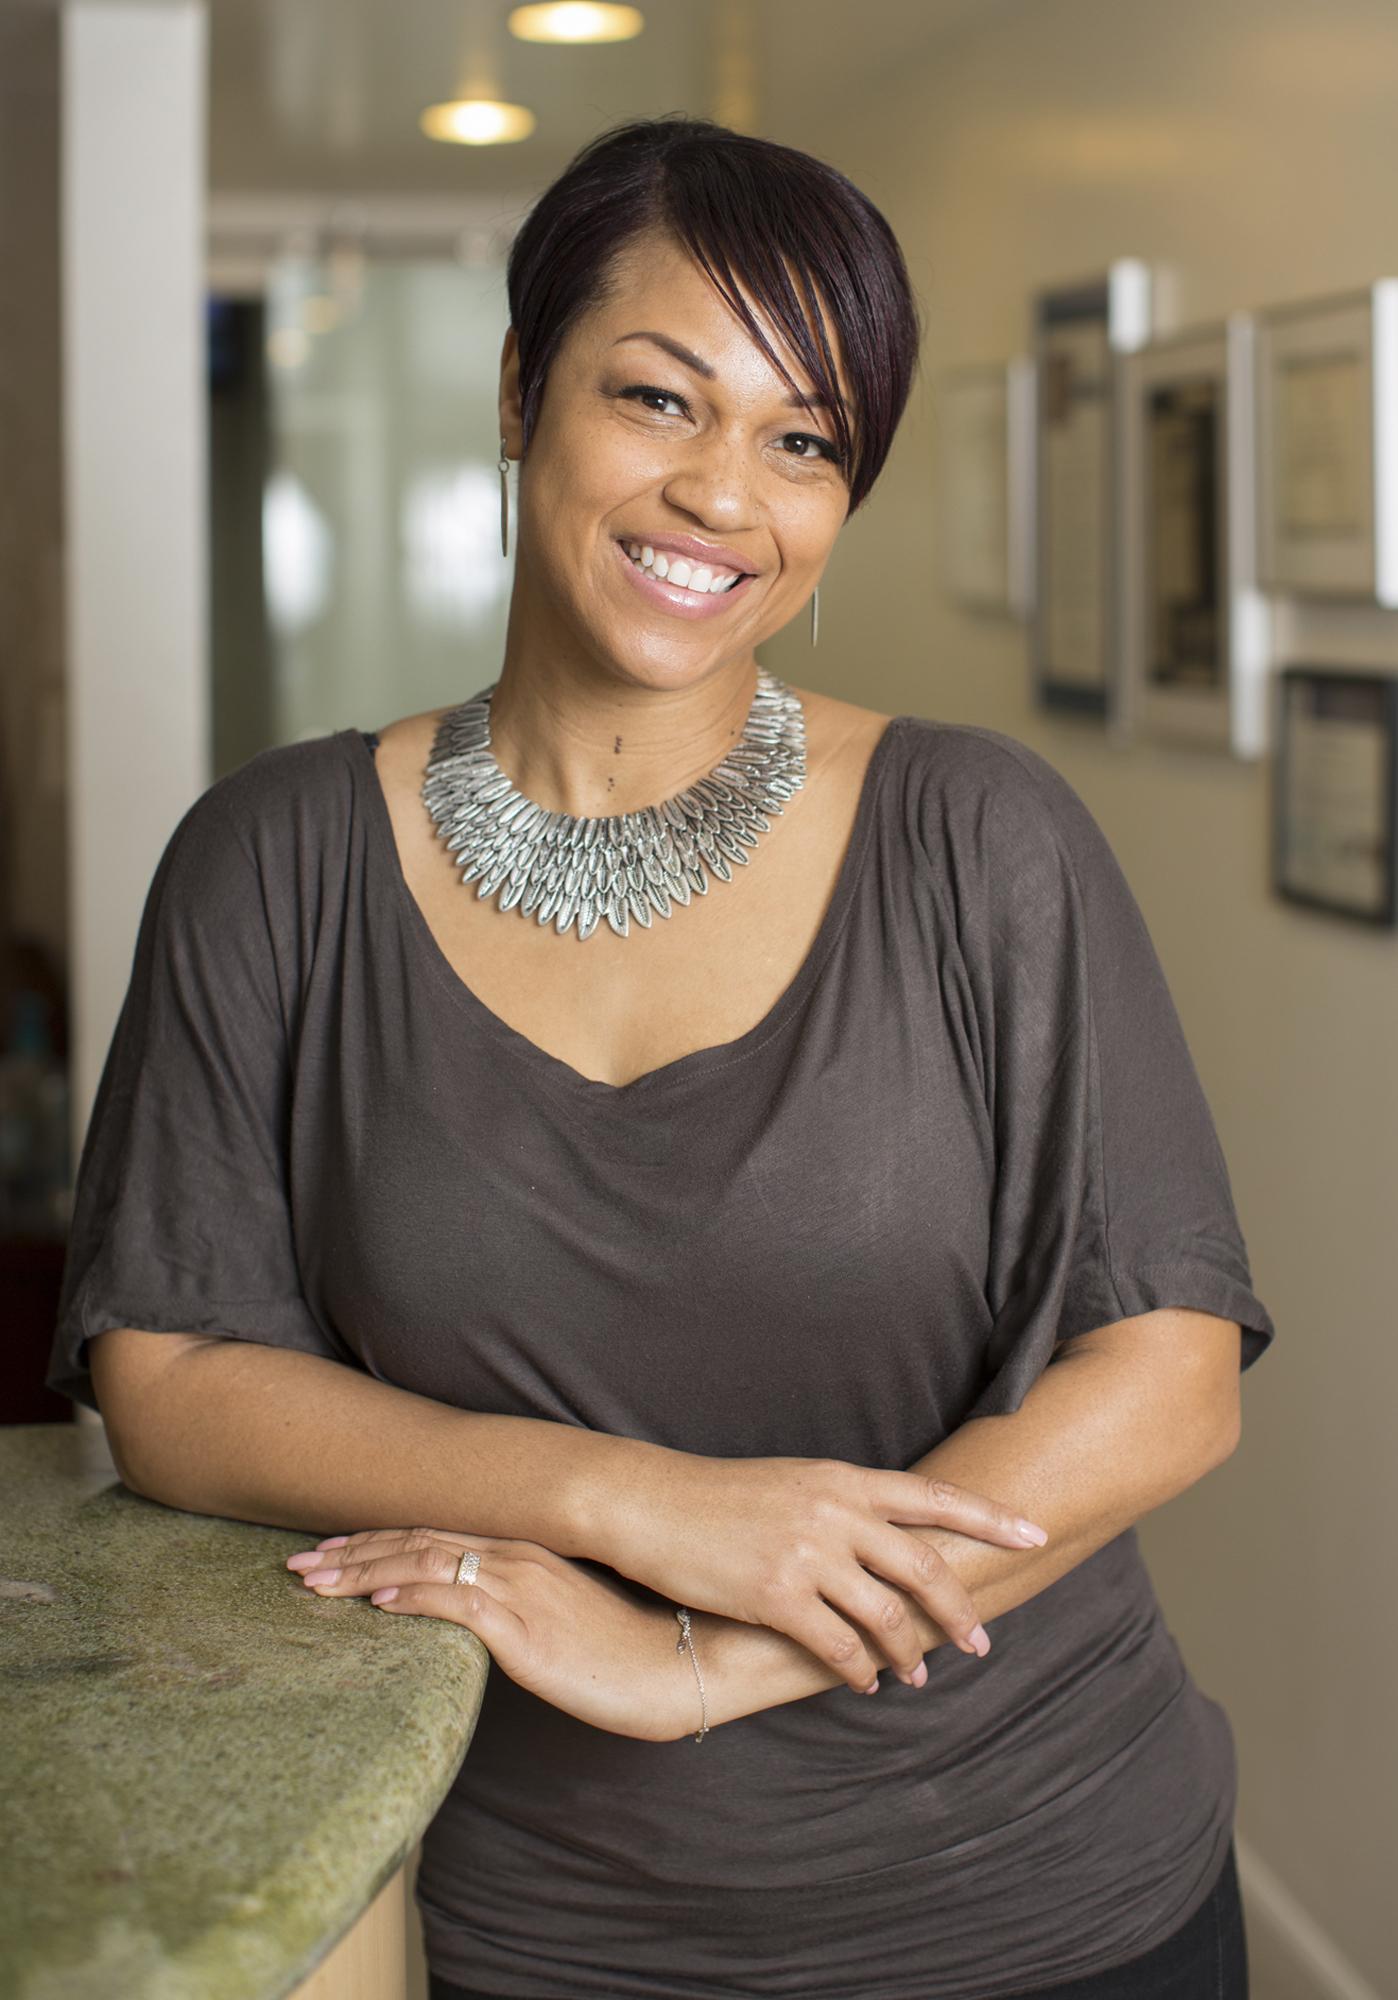 Tamara Synigal, Office Manager at Nice Teeth Dental in San Leandro, California.